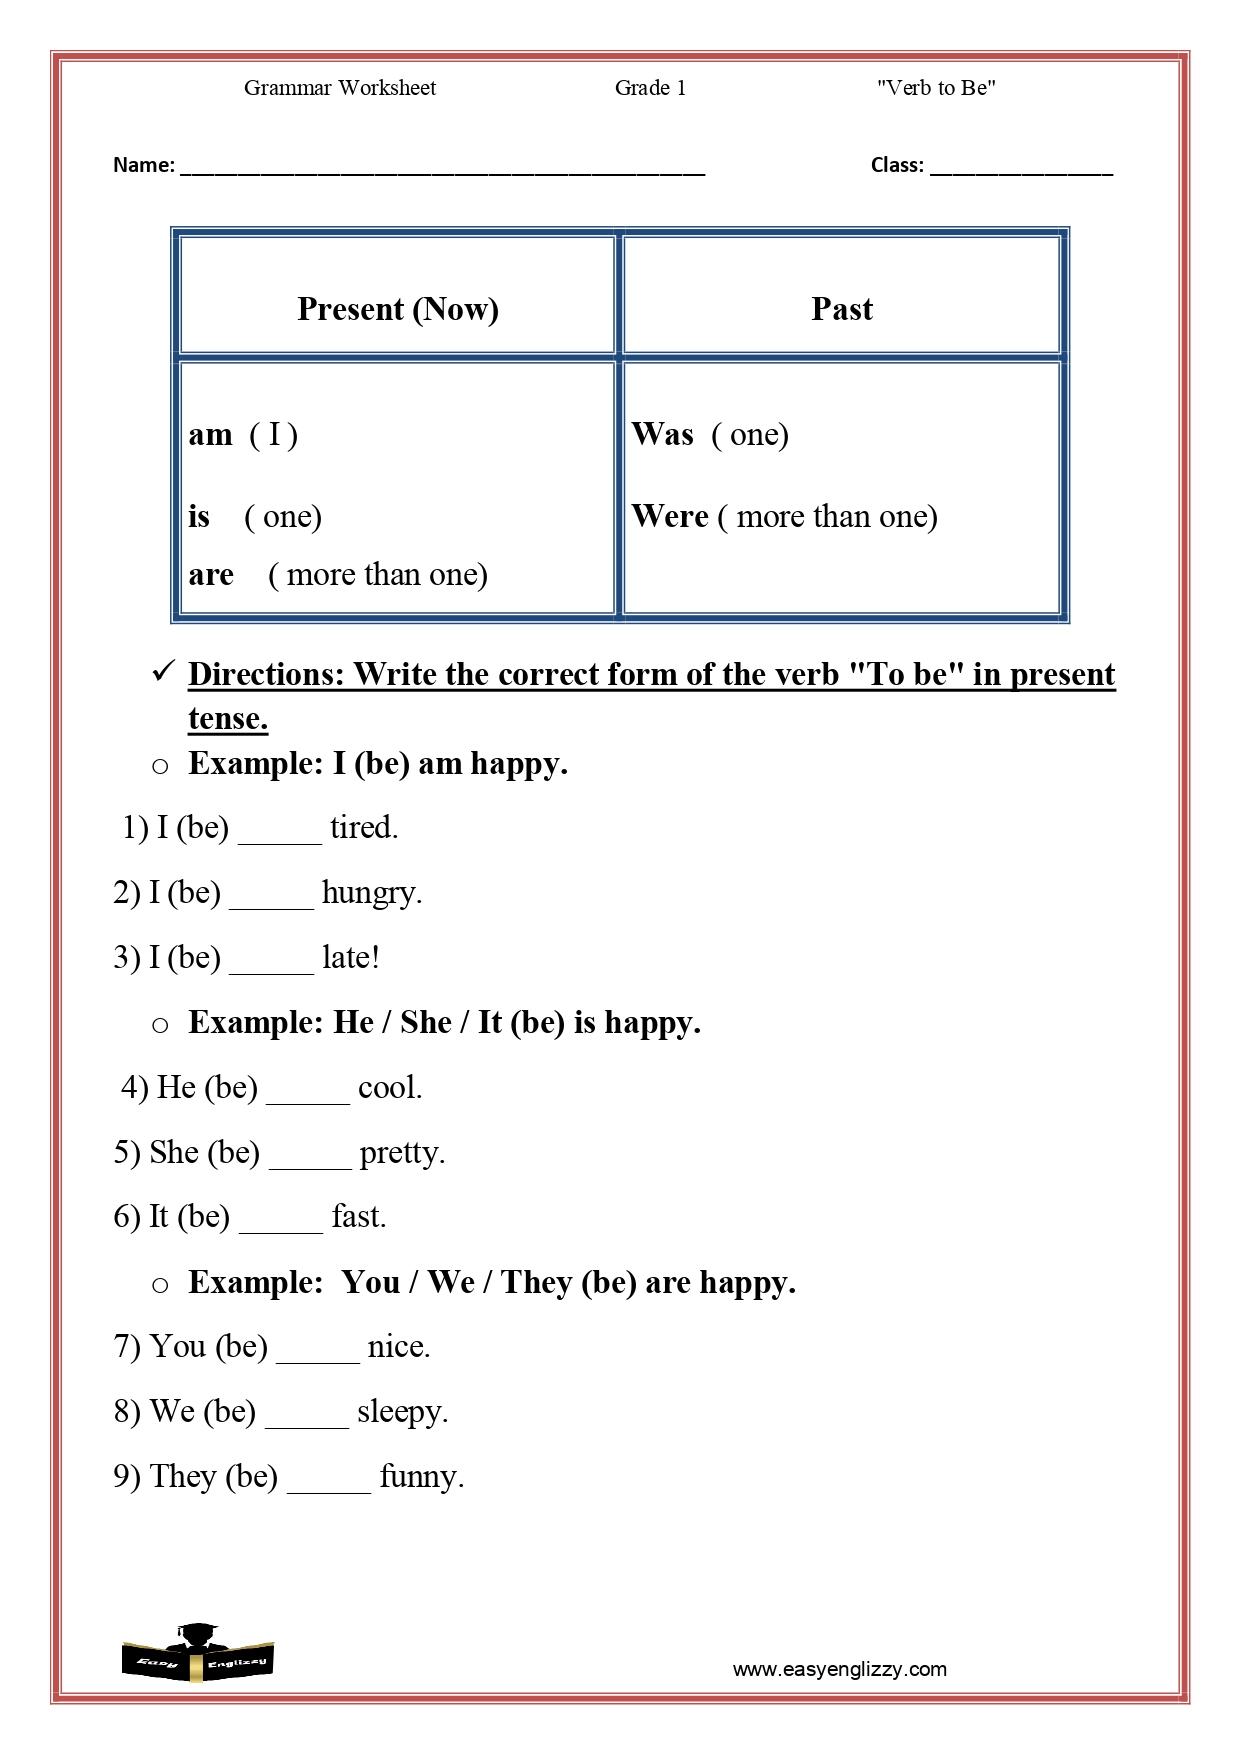 Grammar Worksheet Grade 1 Easy Englizzy